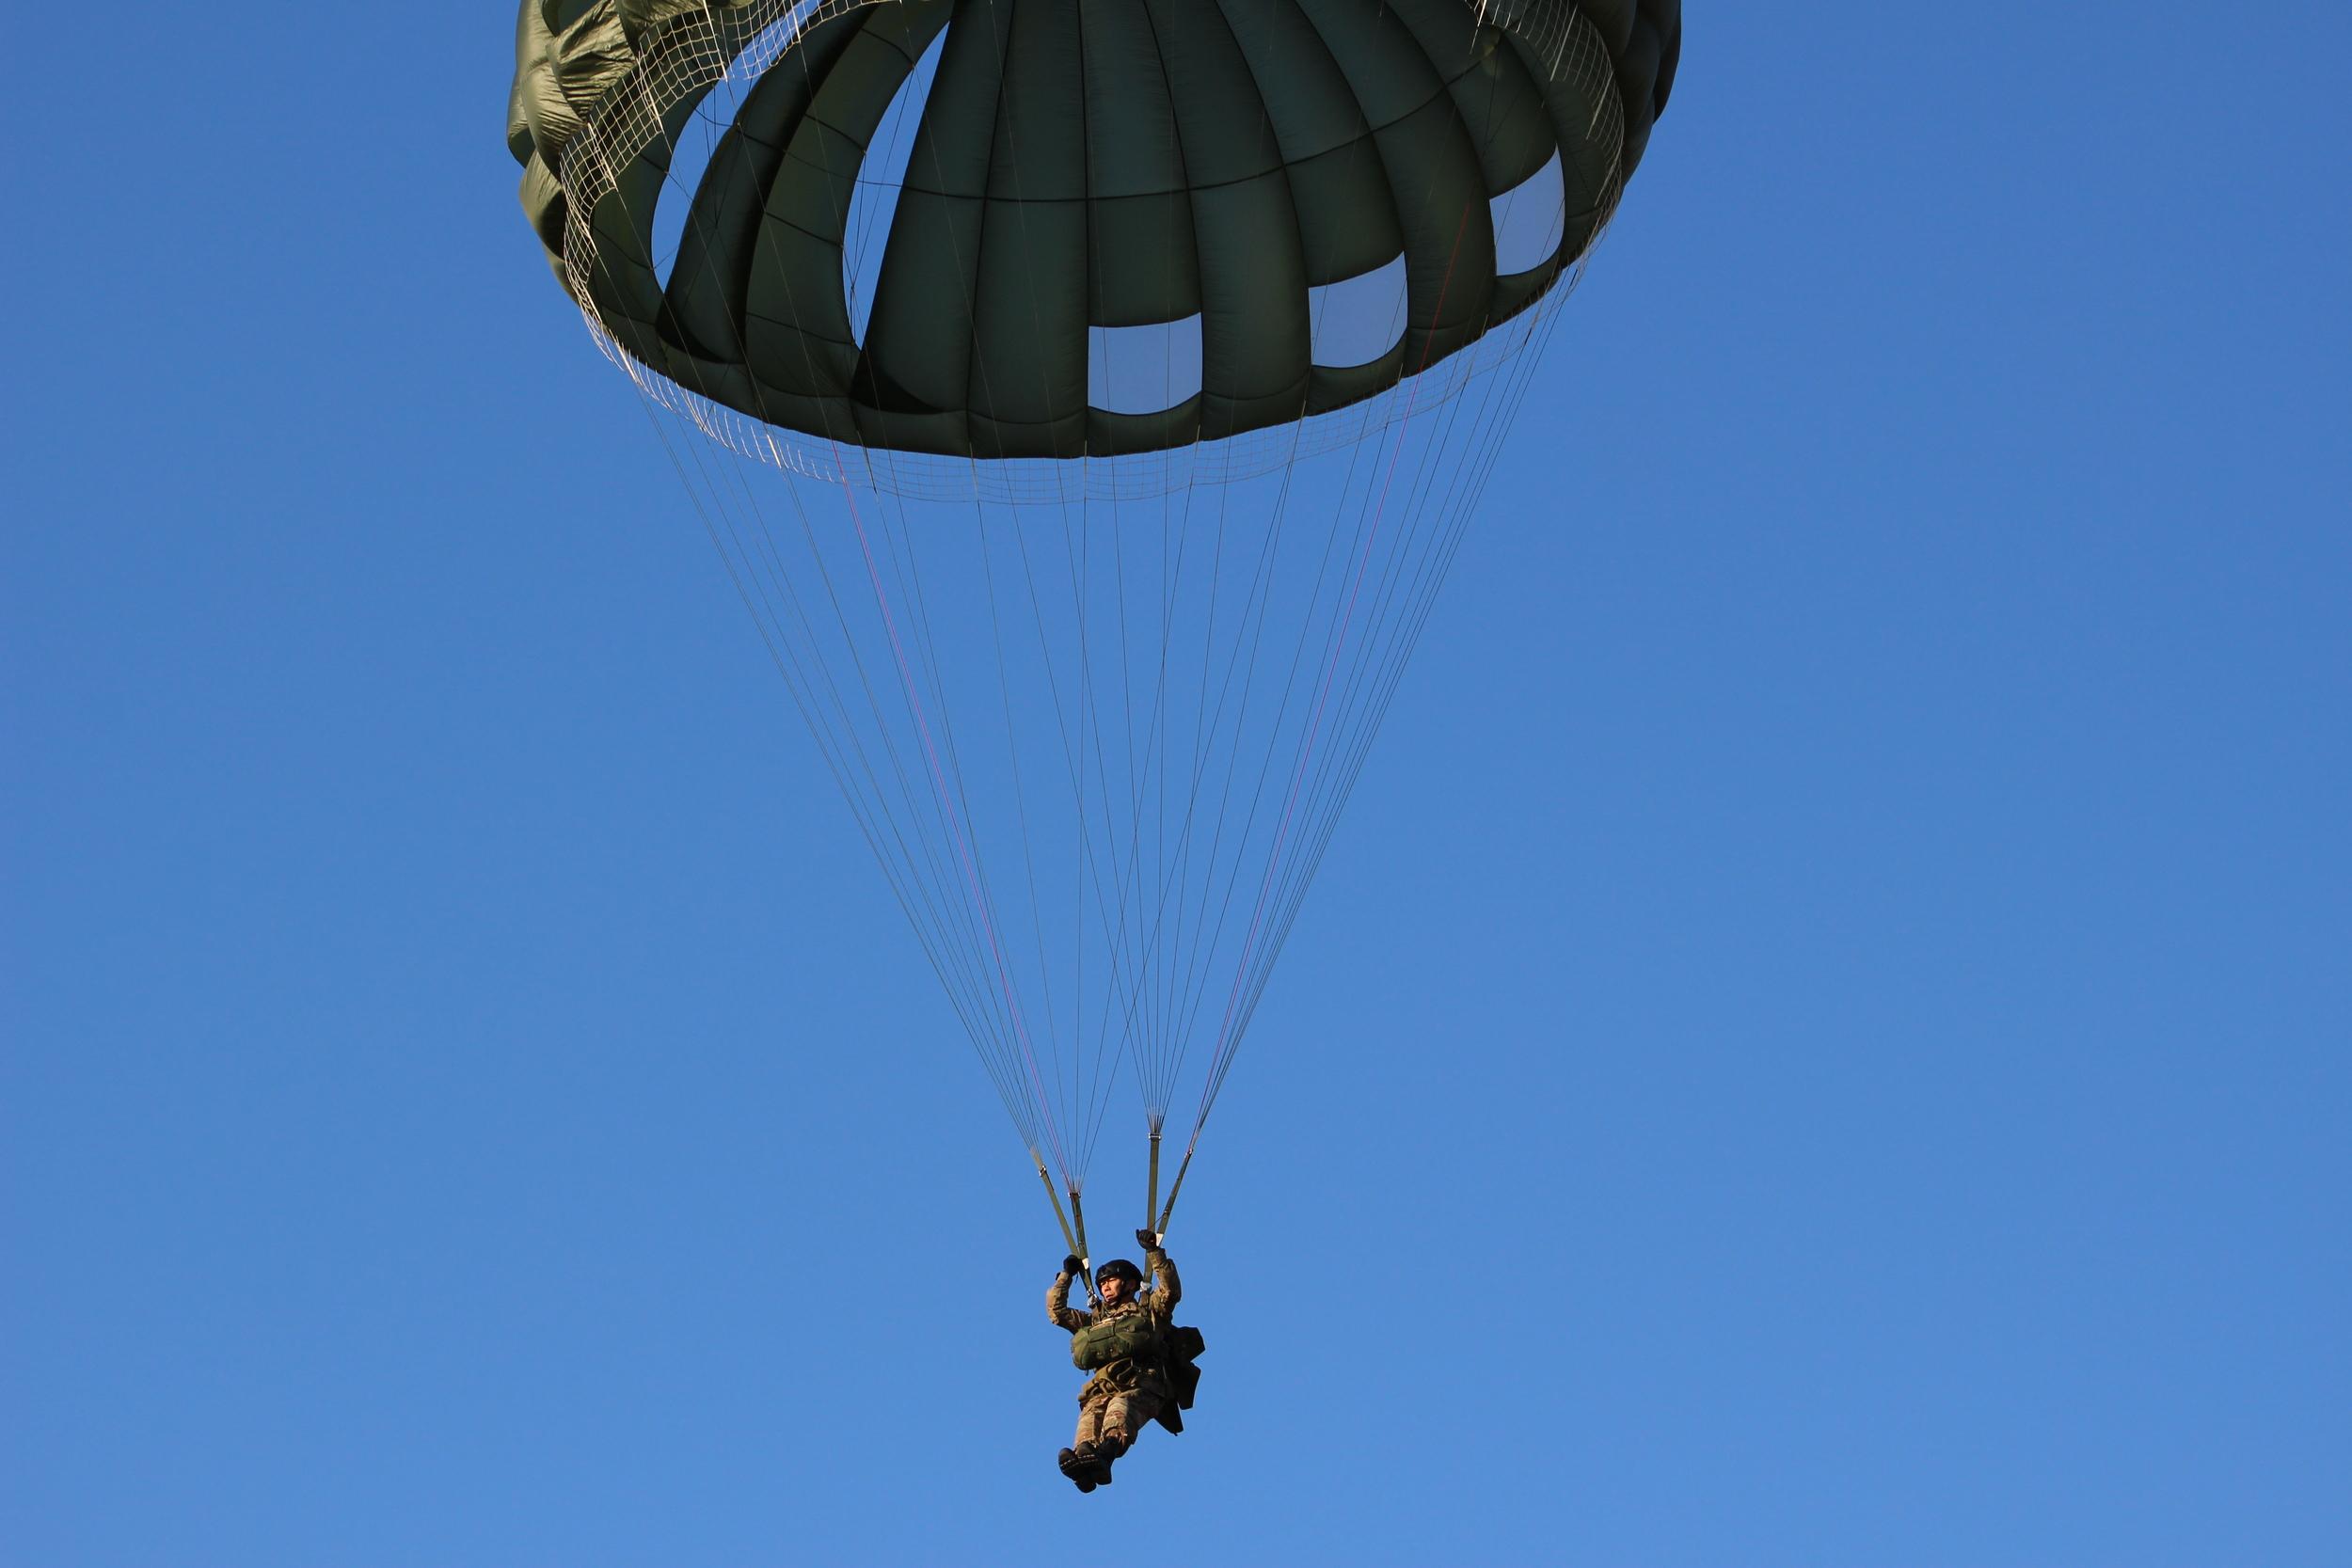 Lisa pics from jump event - 13feb16 (56).JPG